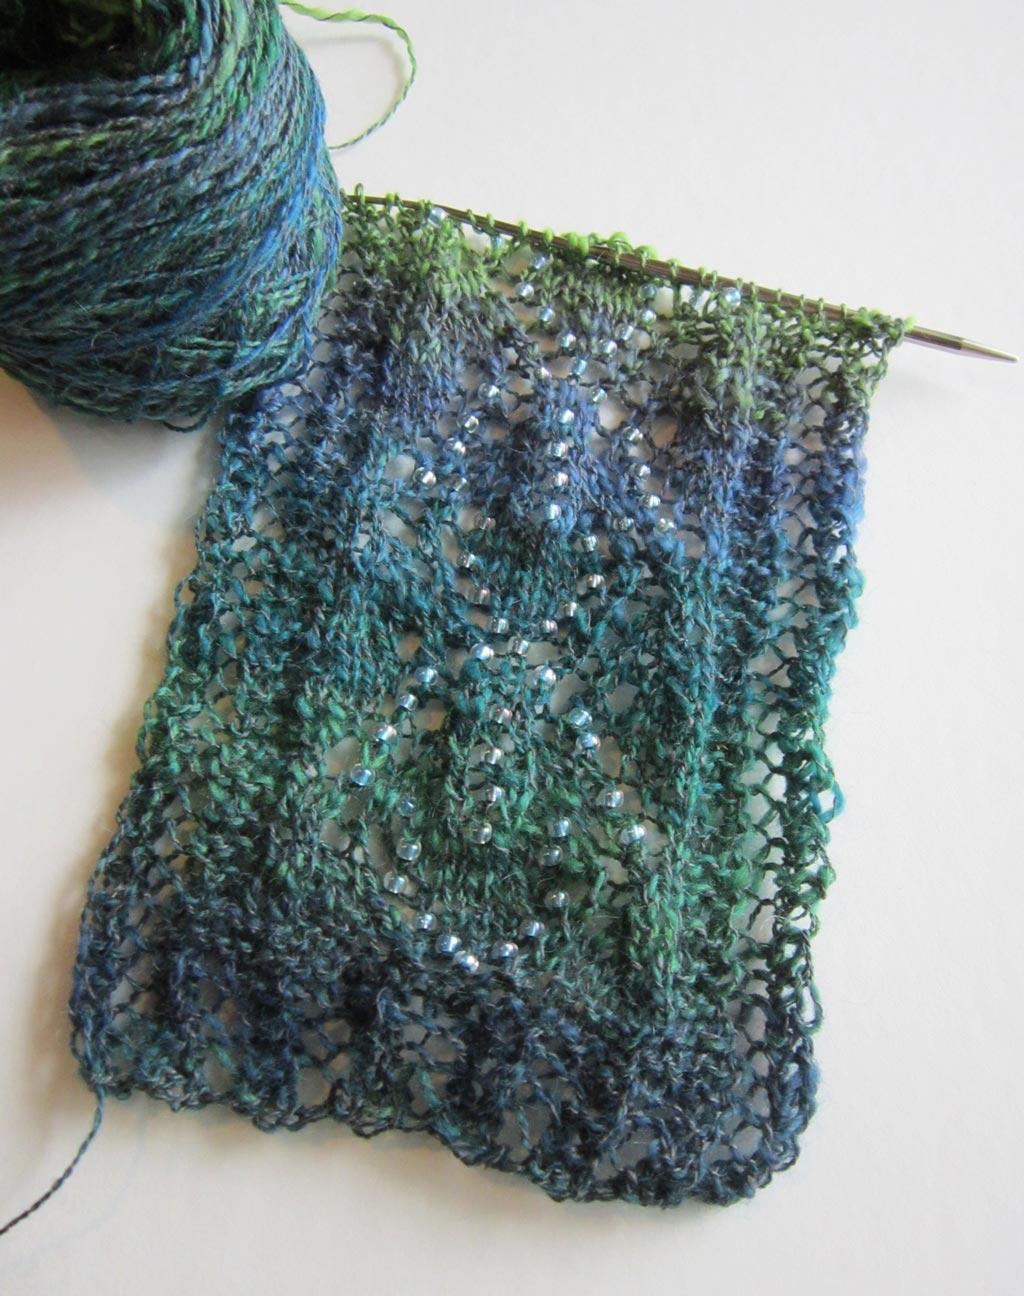 Bonus an option to beading the lace leaf pattern stitch knit bonus an option to beading the lace leaf pattern stitch bankloansurffo Gallery